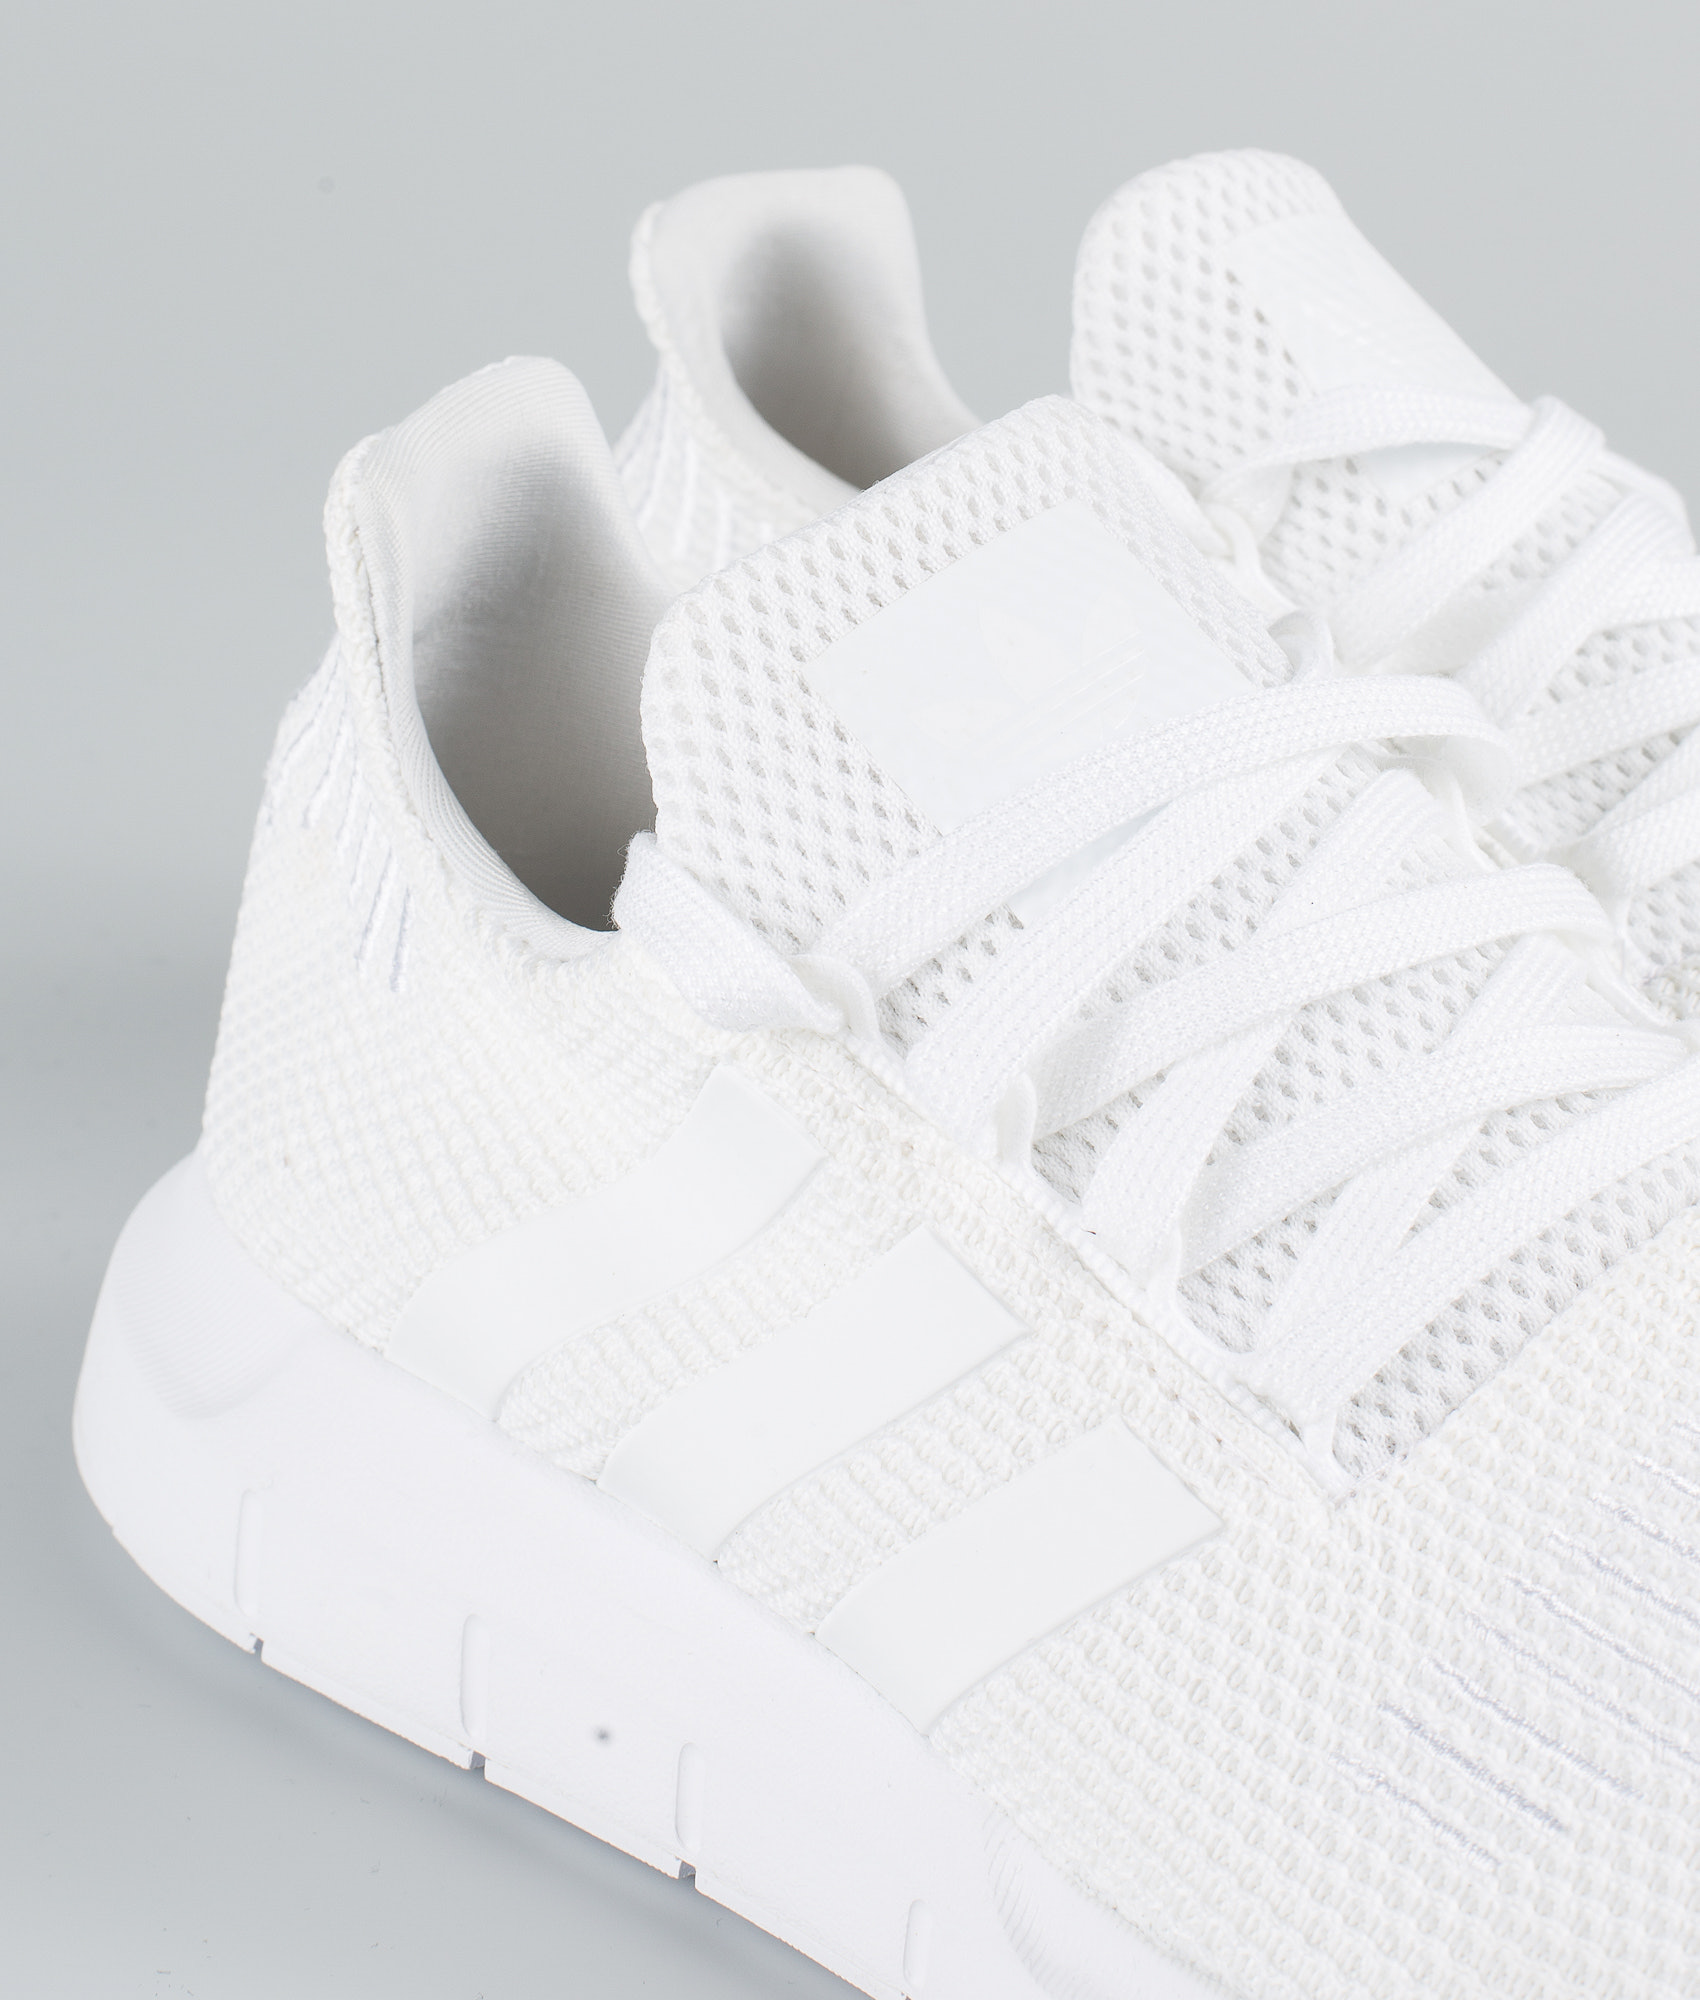 0248922d2 Adidas Originals Swift Run Shoes Ftwr White Ftwr White Core Black ...